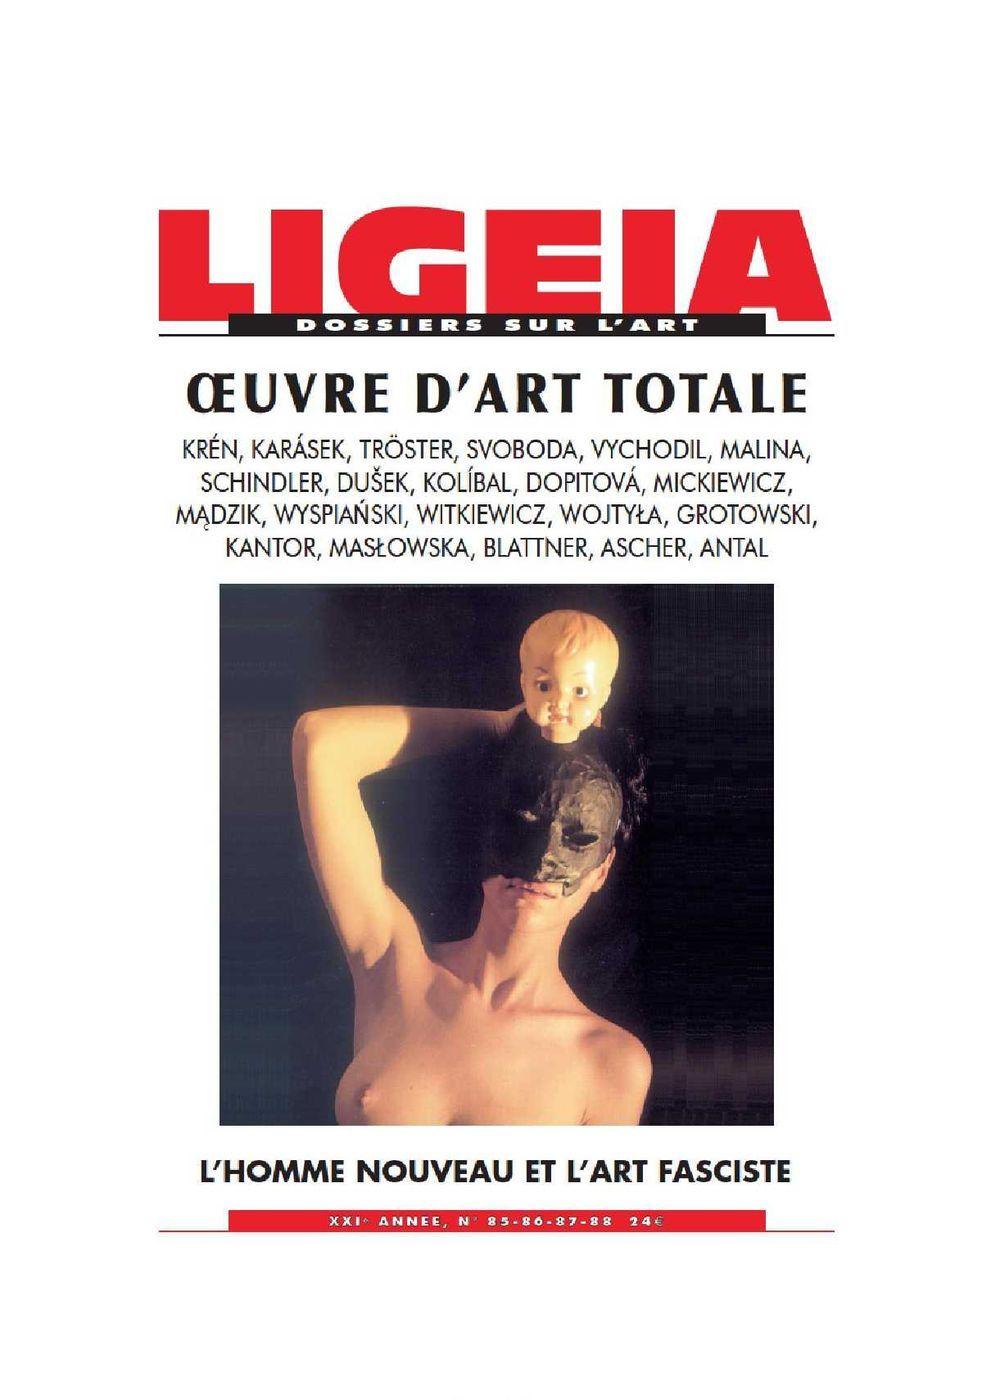 LIGEIA 0EUVRE ART TOTALE - LIGE85